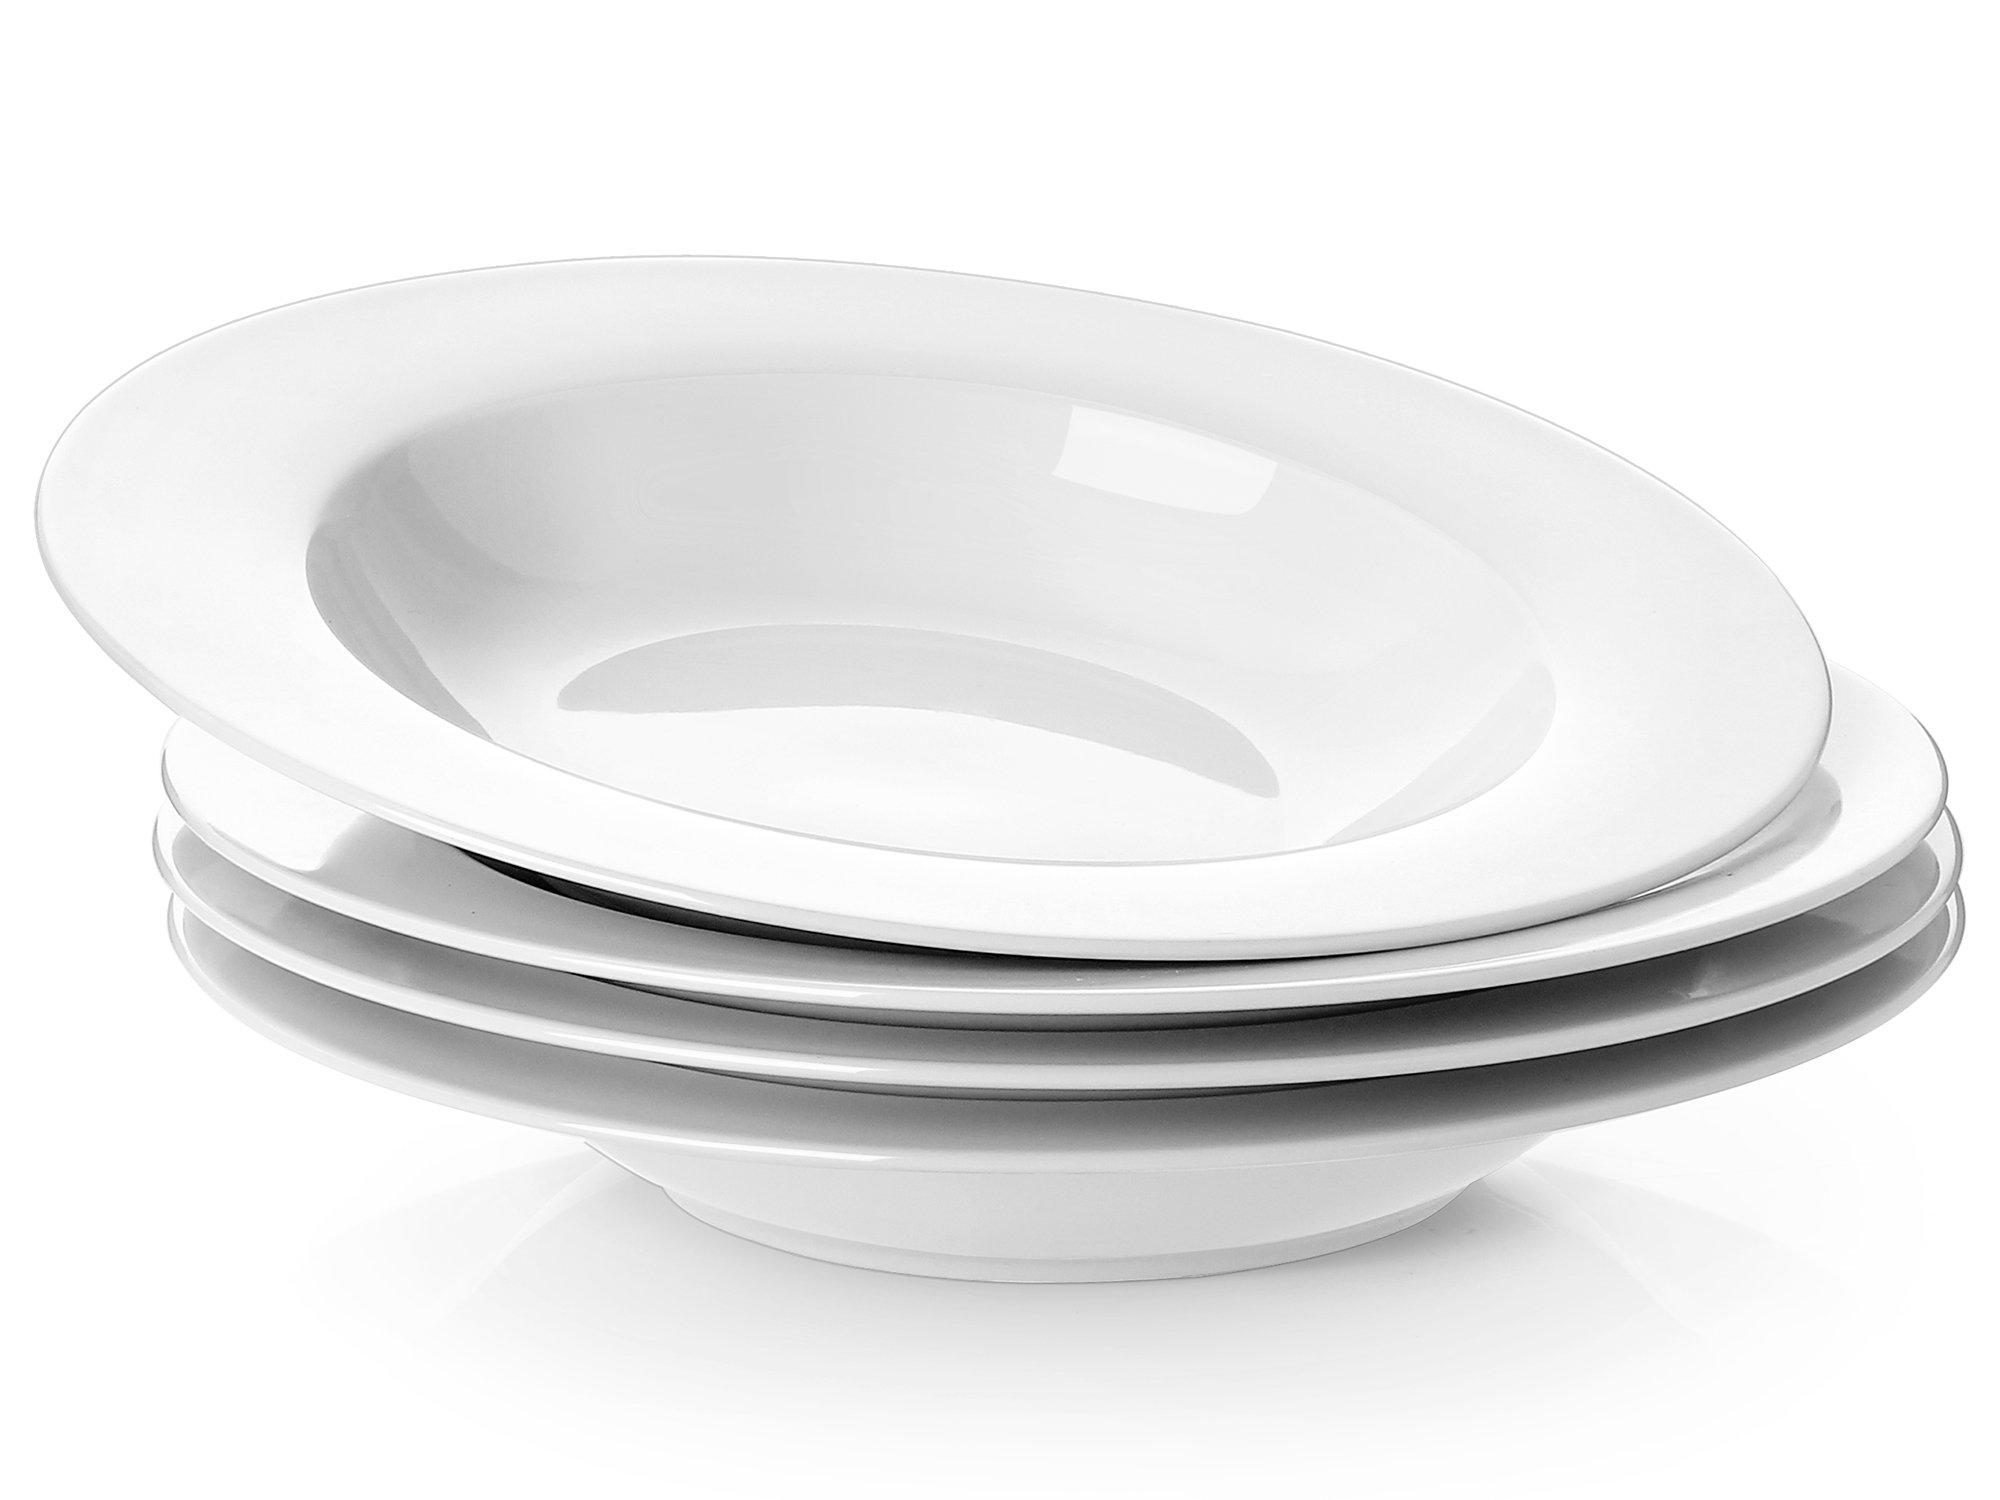 YHY 8-1/4-inch Porcelain Soup Bowls/Rim Bowl Set, White, Set of 4